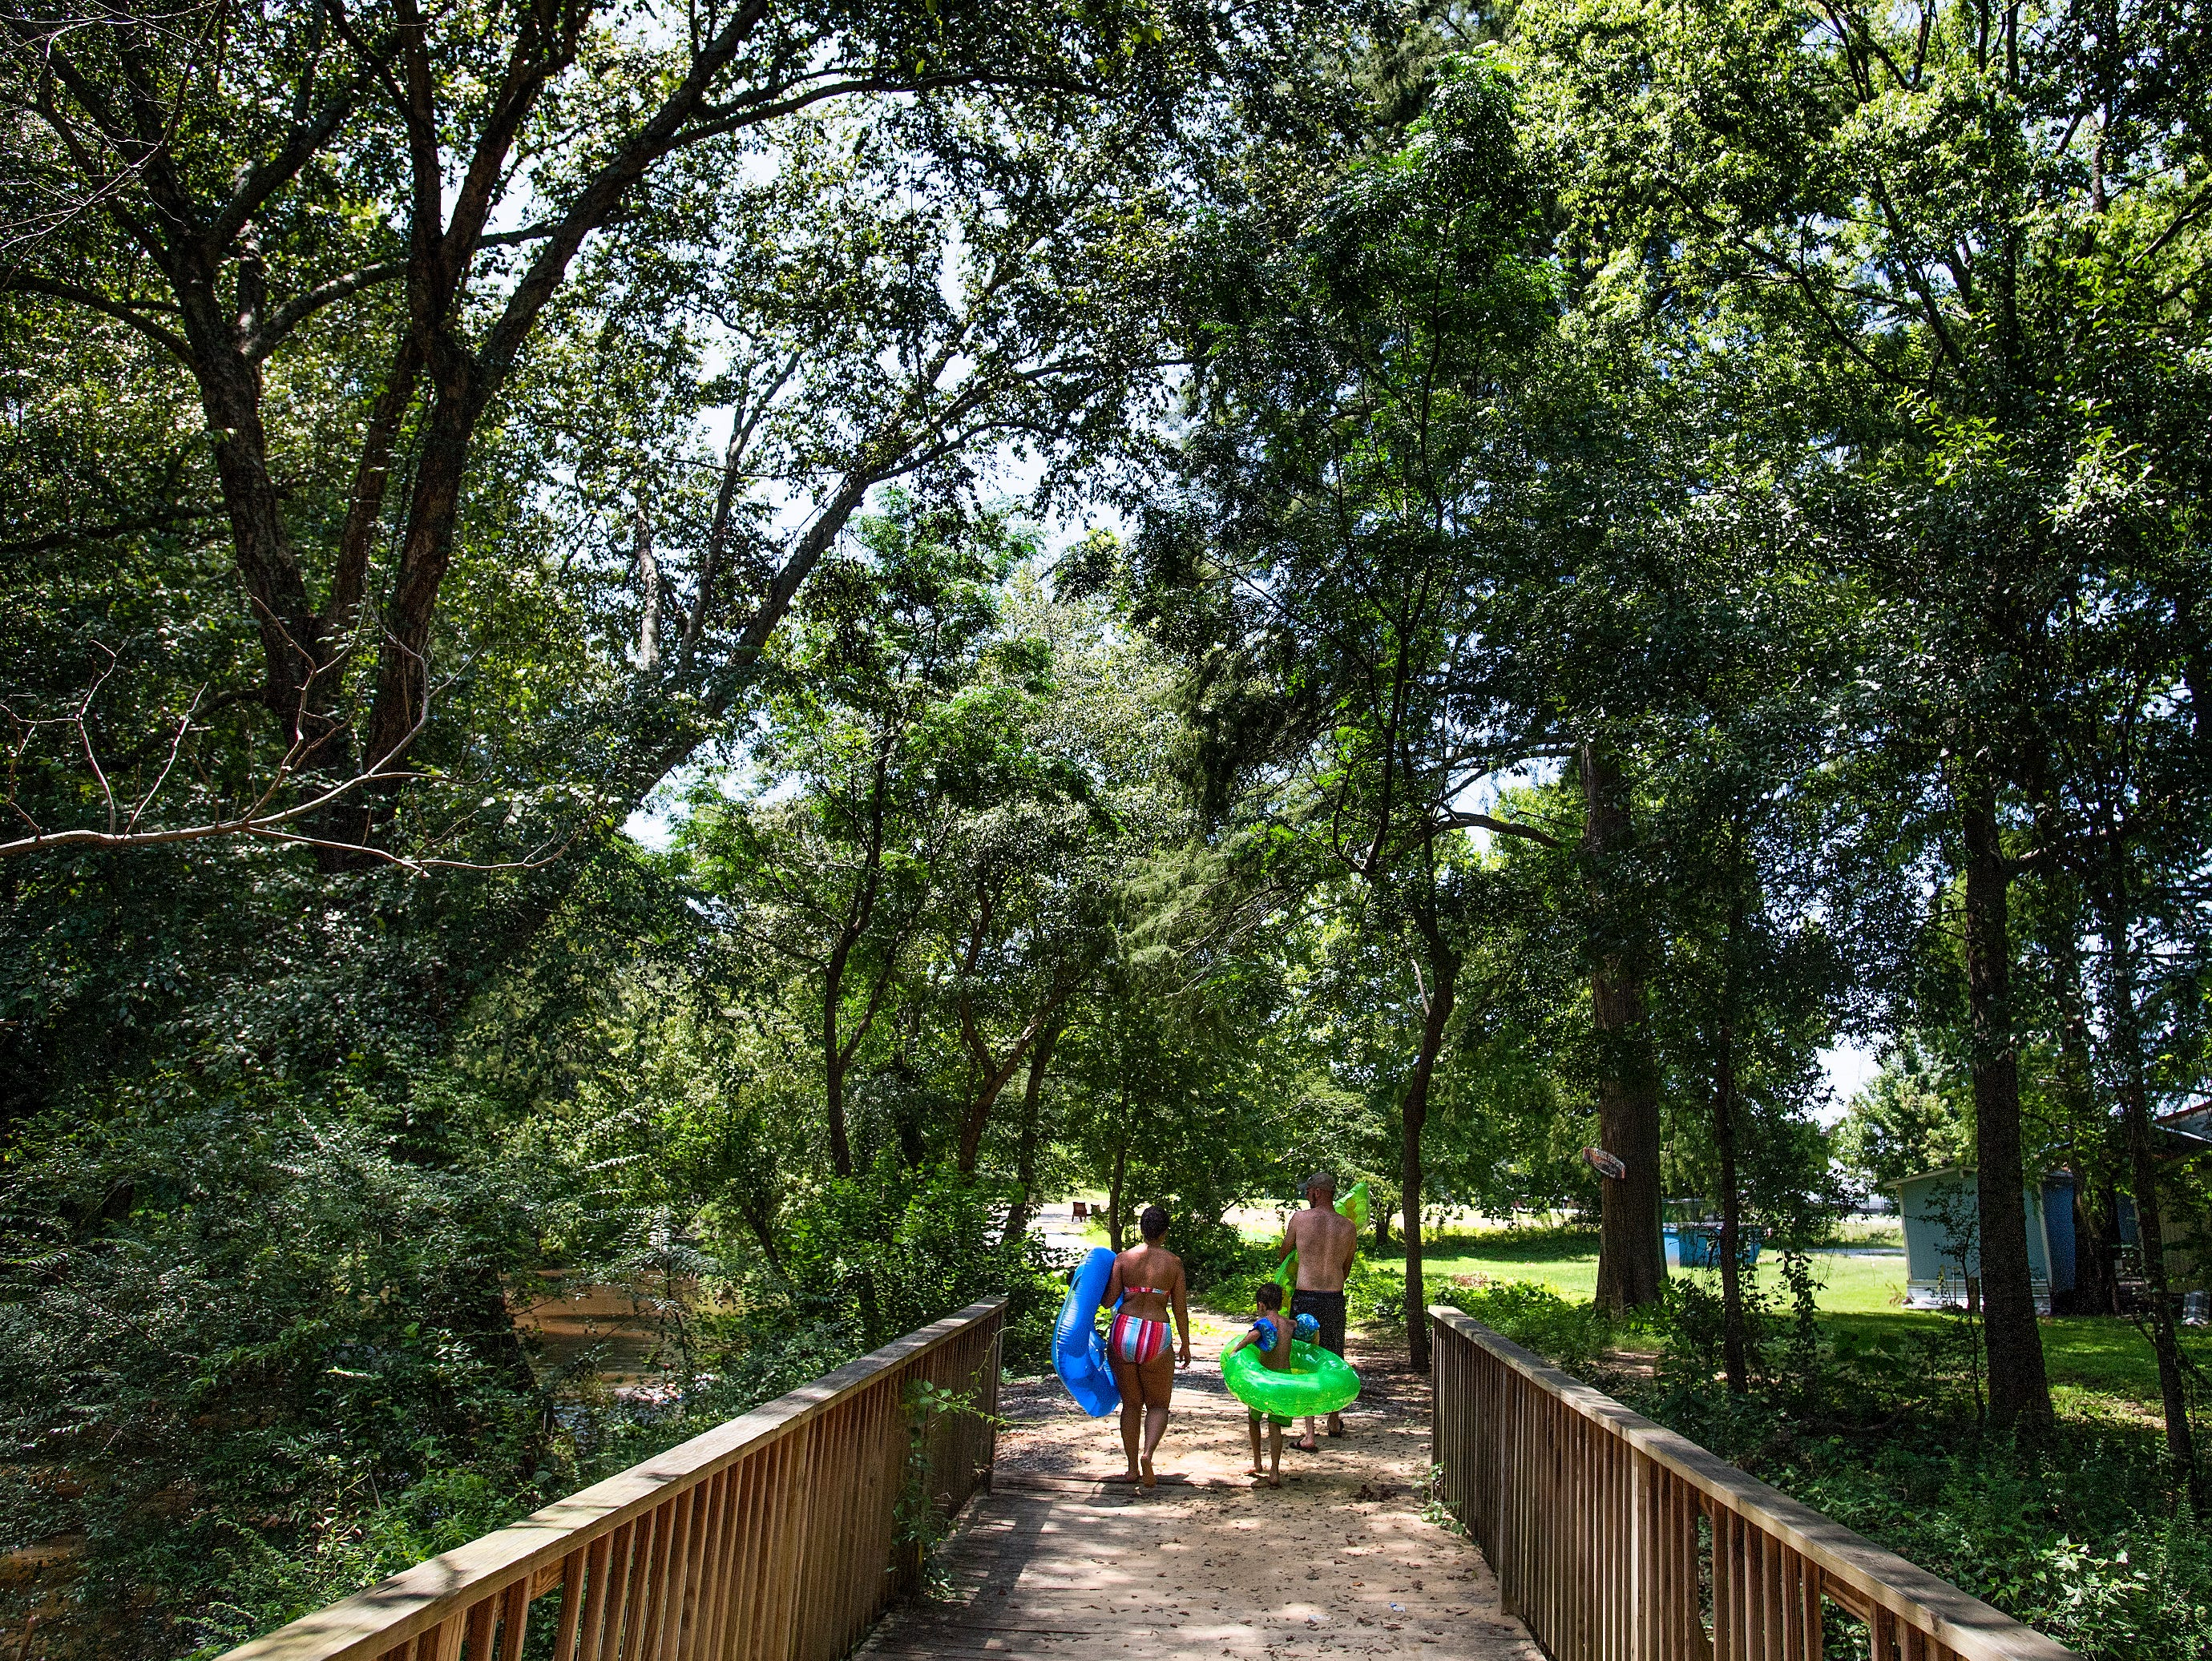 Blake Bailey, Coen Bailey and Cassandra George walk beside Autauga Creek in Prattville, Ala., on Saturday, July 21, 2018.